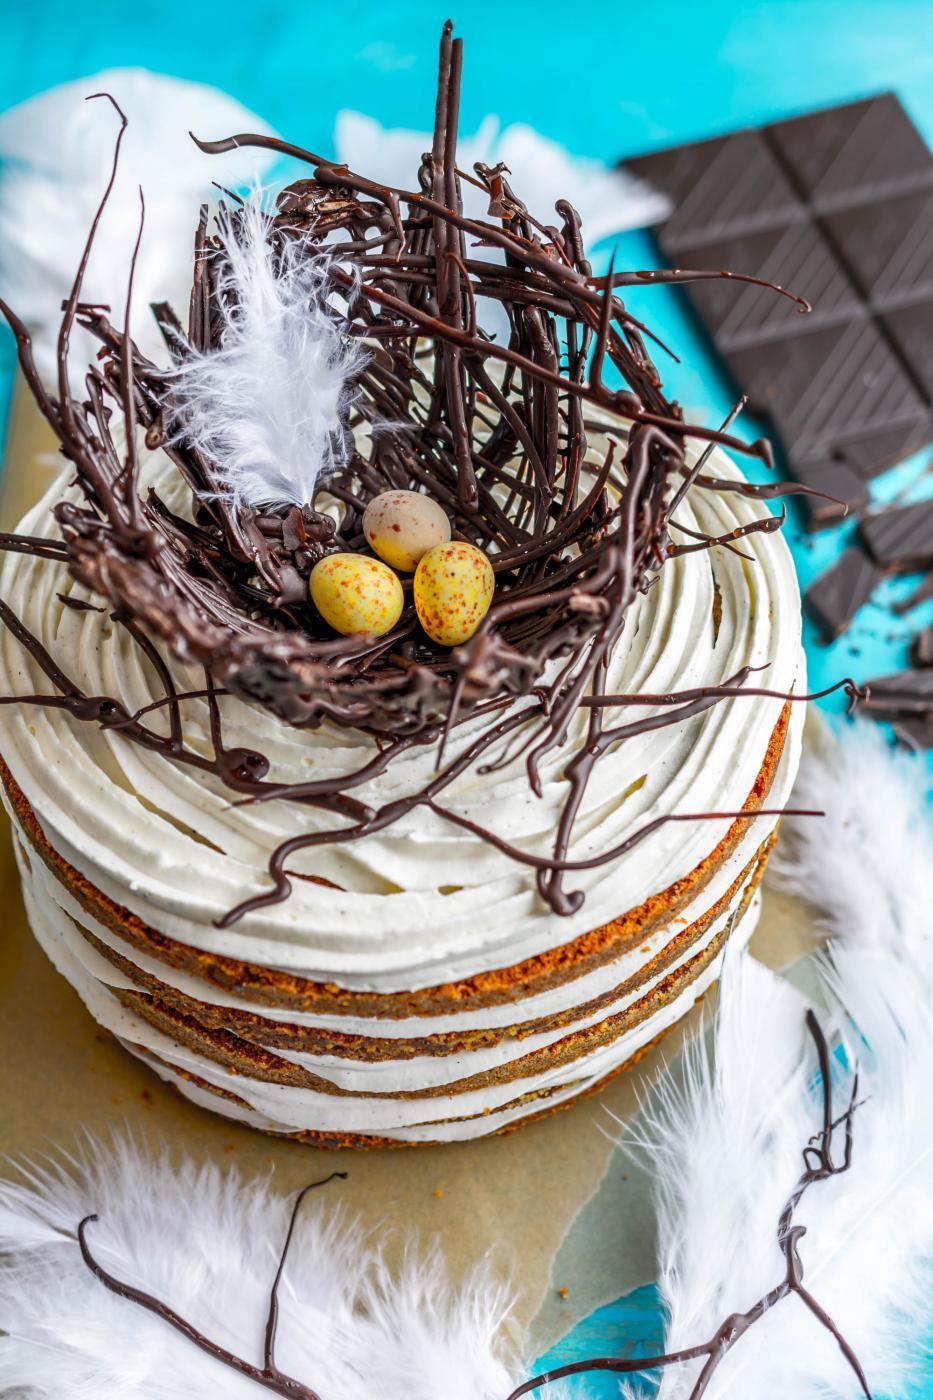 Mikäs tipu se kakun päälle pesi?